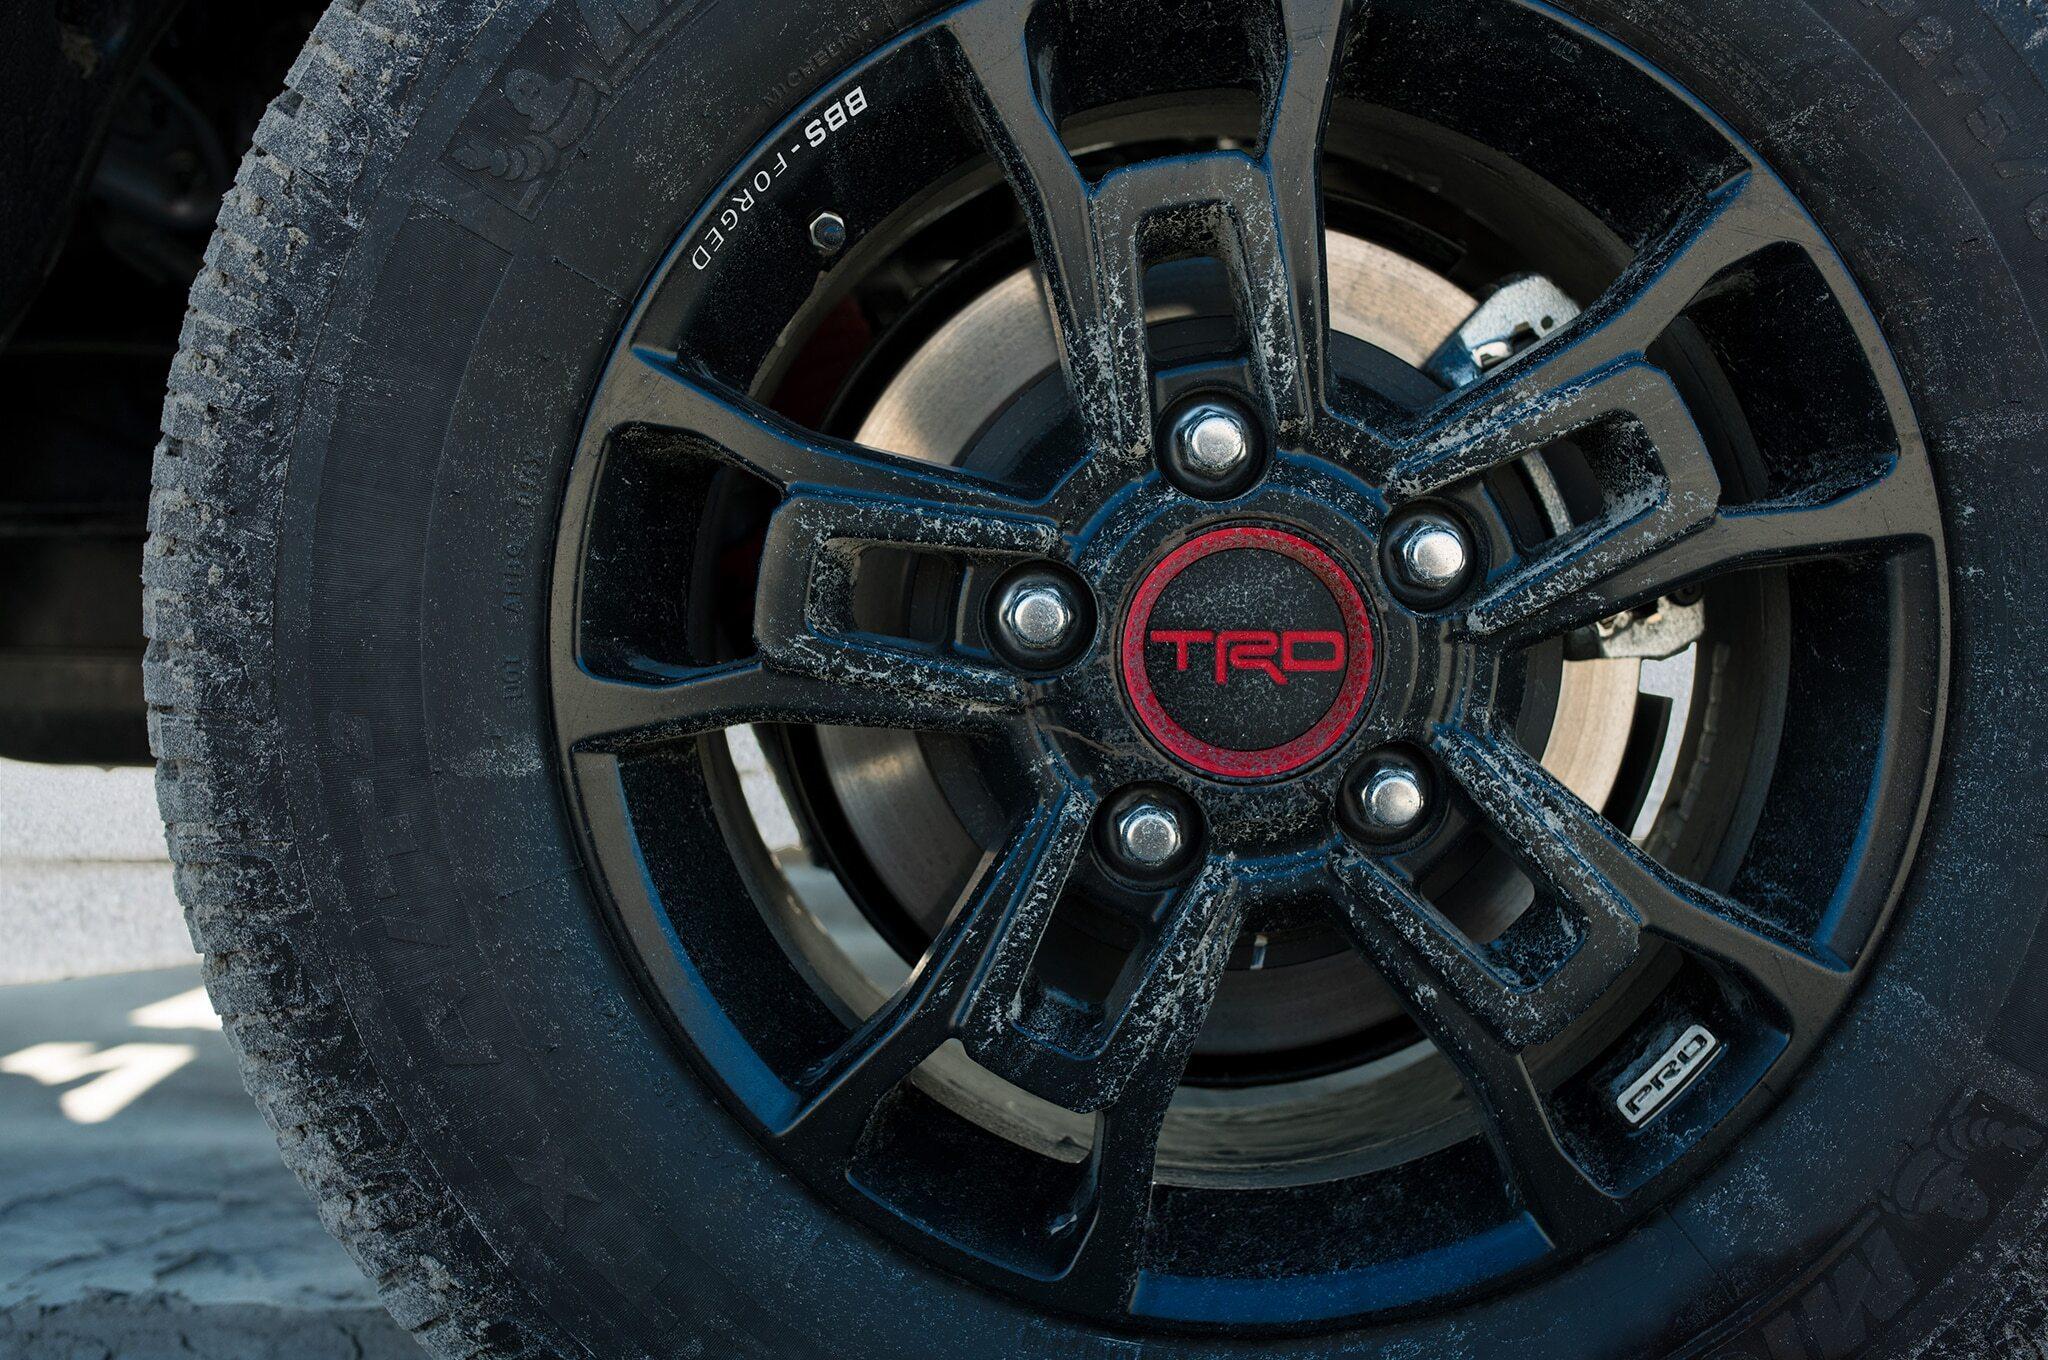 2019-Toyota-Tundra-TRD-Pro-wheel